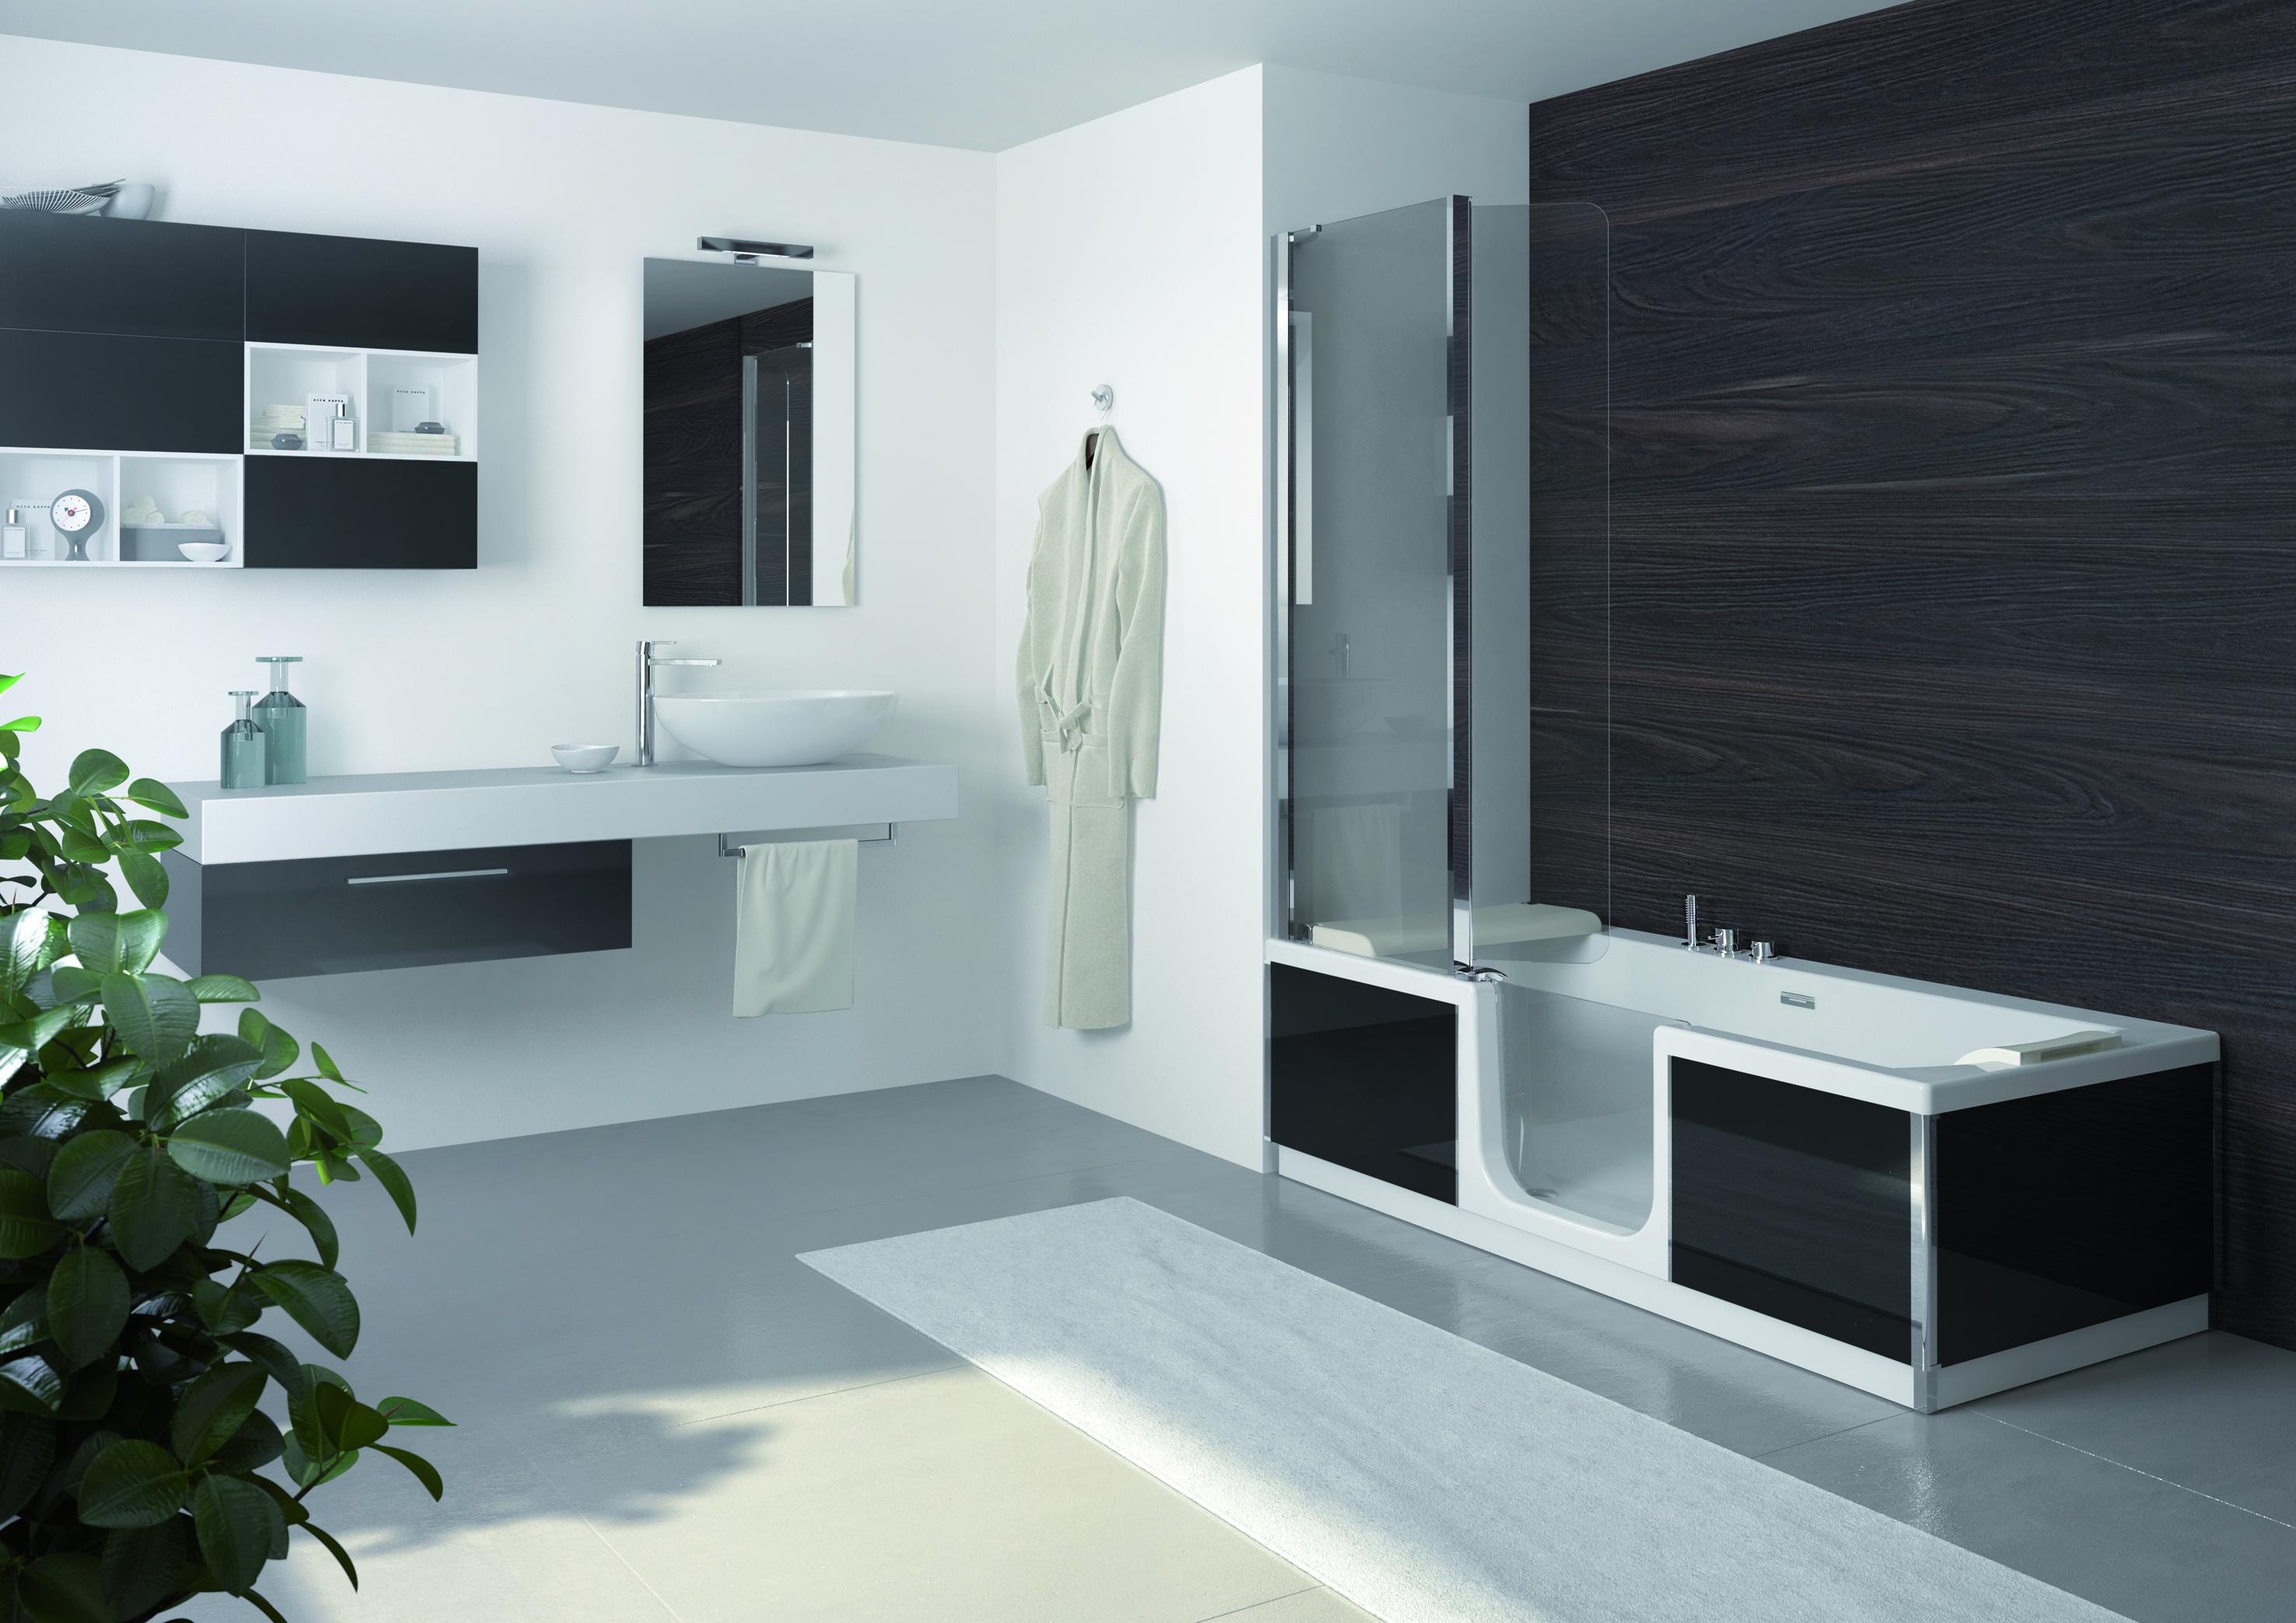 saniduo habitanova. Black Bedroom Furniture Sets. Home Design Ideas